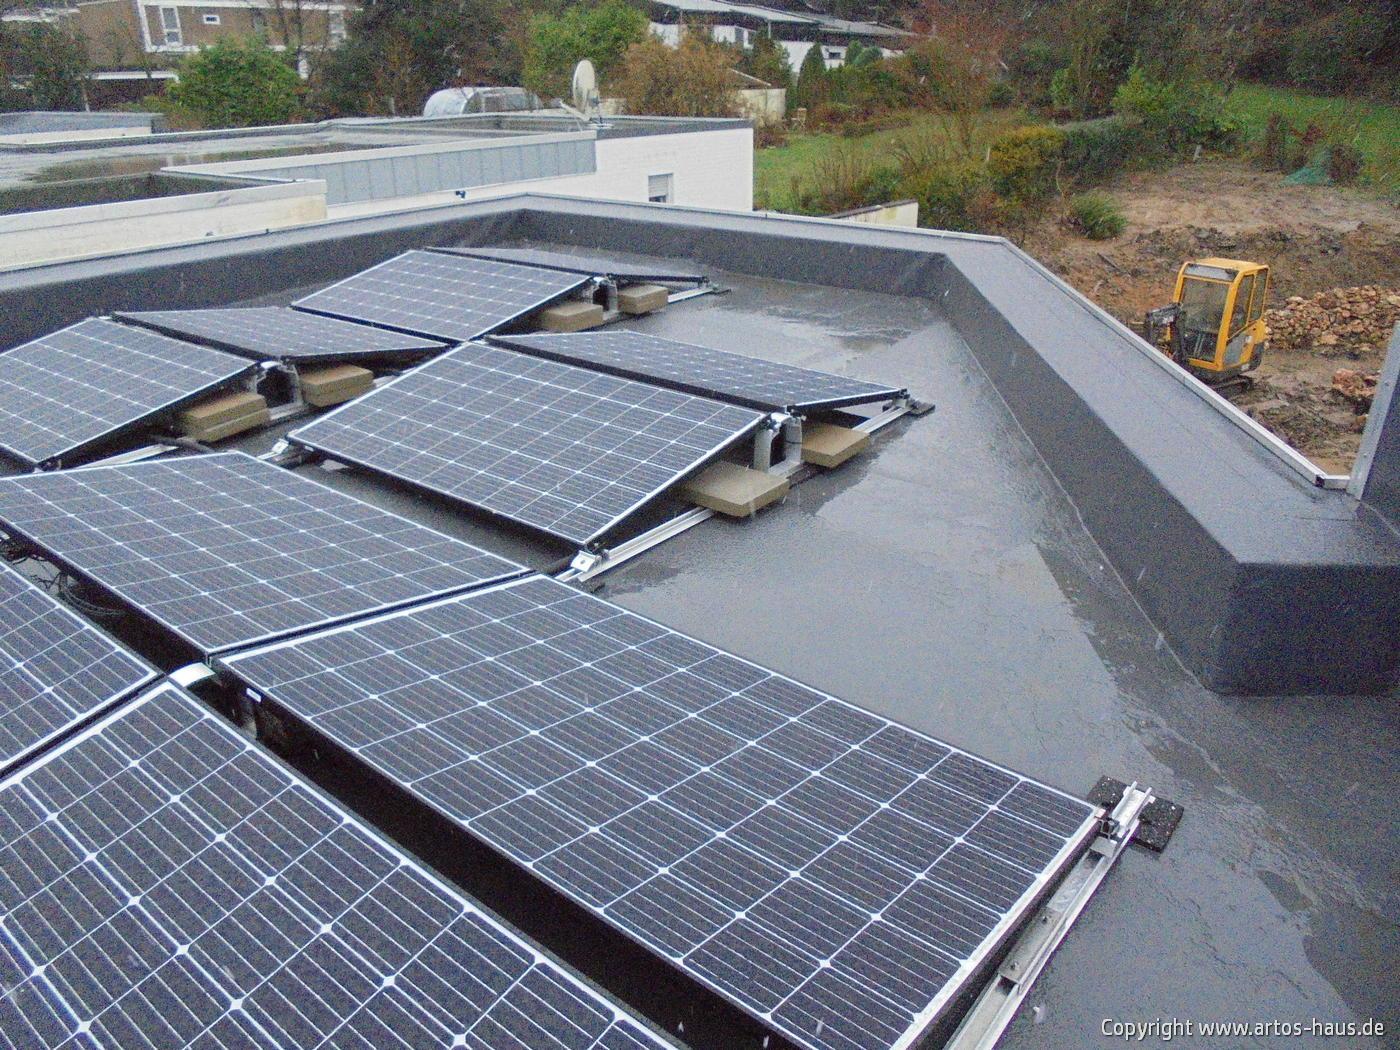 Photovoltaik ARTOS-HAUS Bild 3